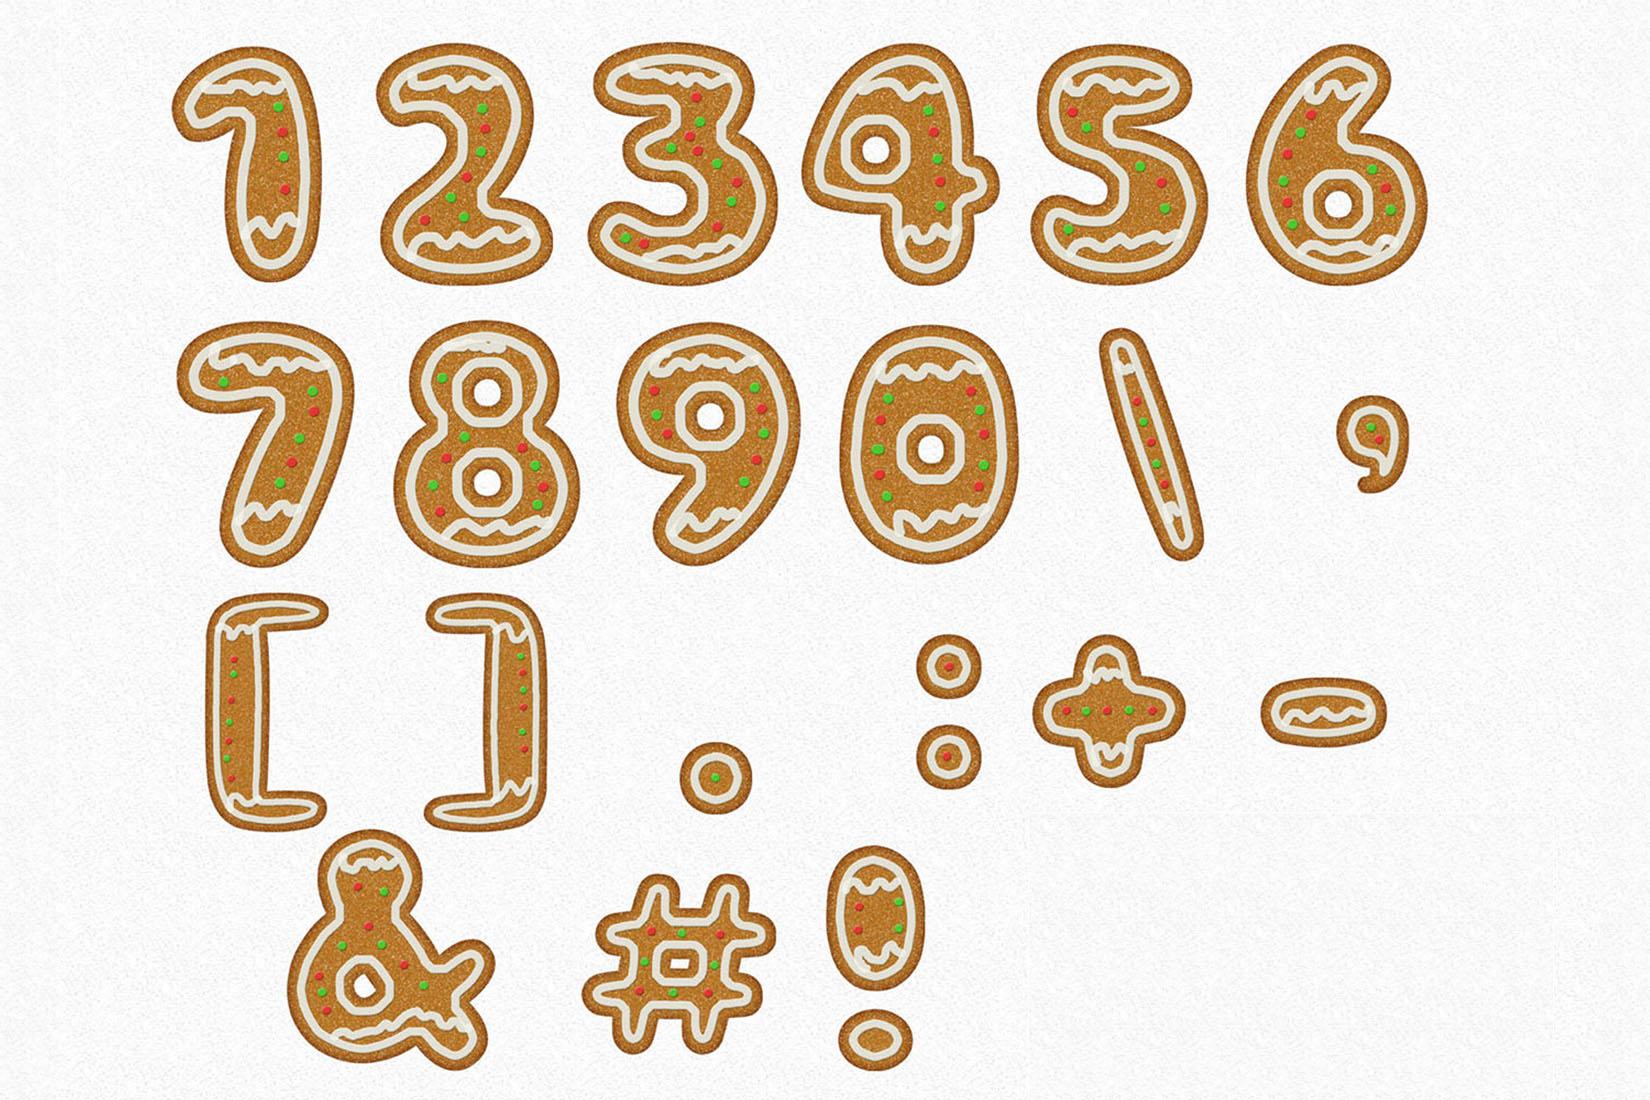 Gingerman Design Bundle - Letters, Numbers, Illustrations example image 6